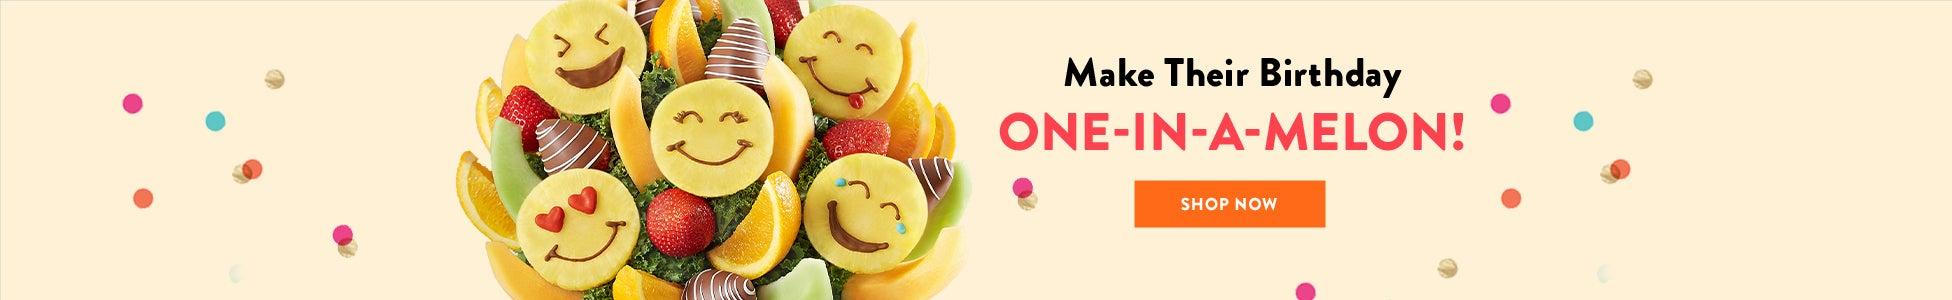 Make Their Birthday One In A Melon